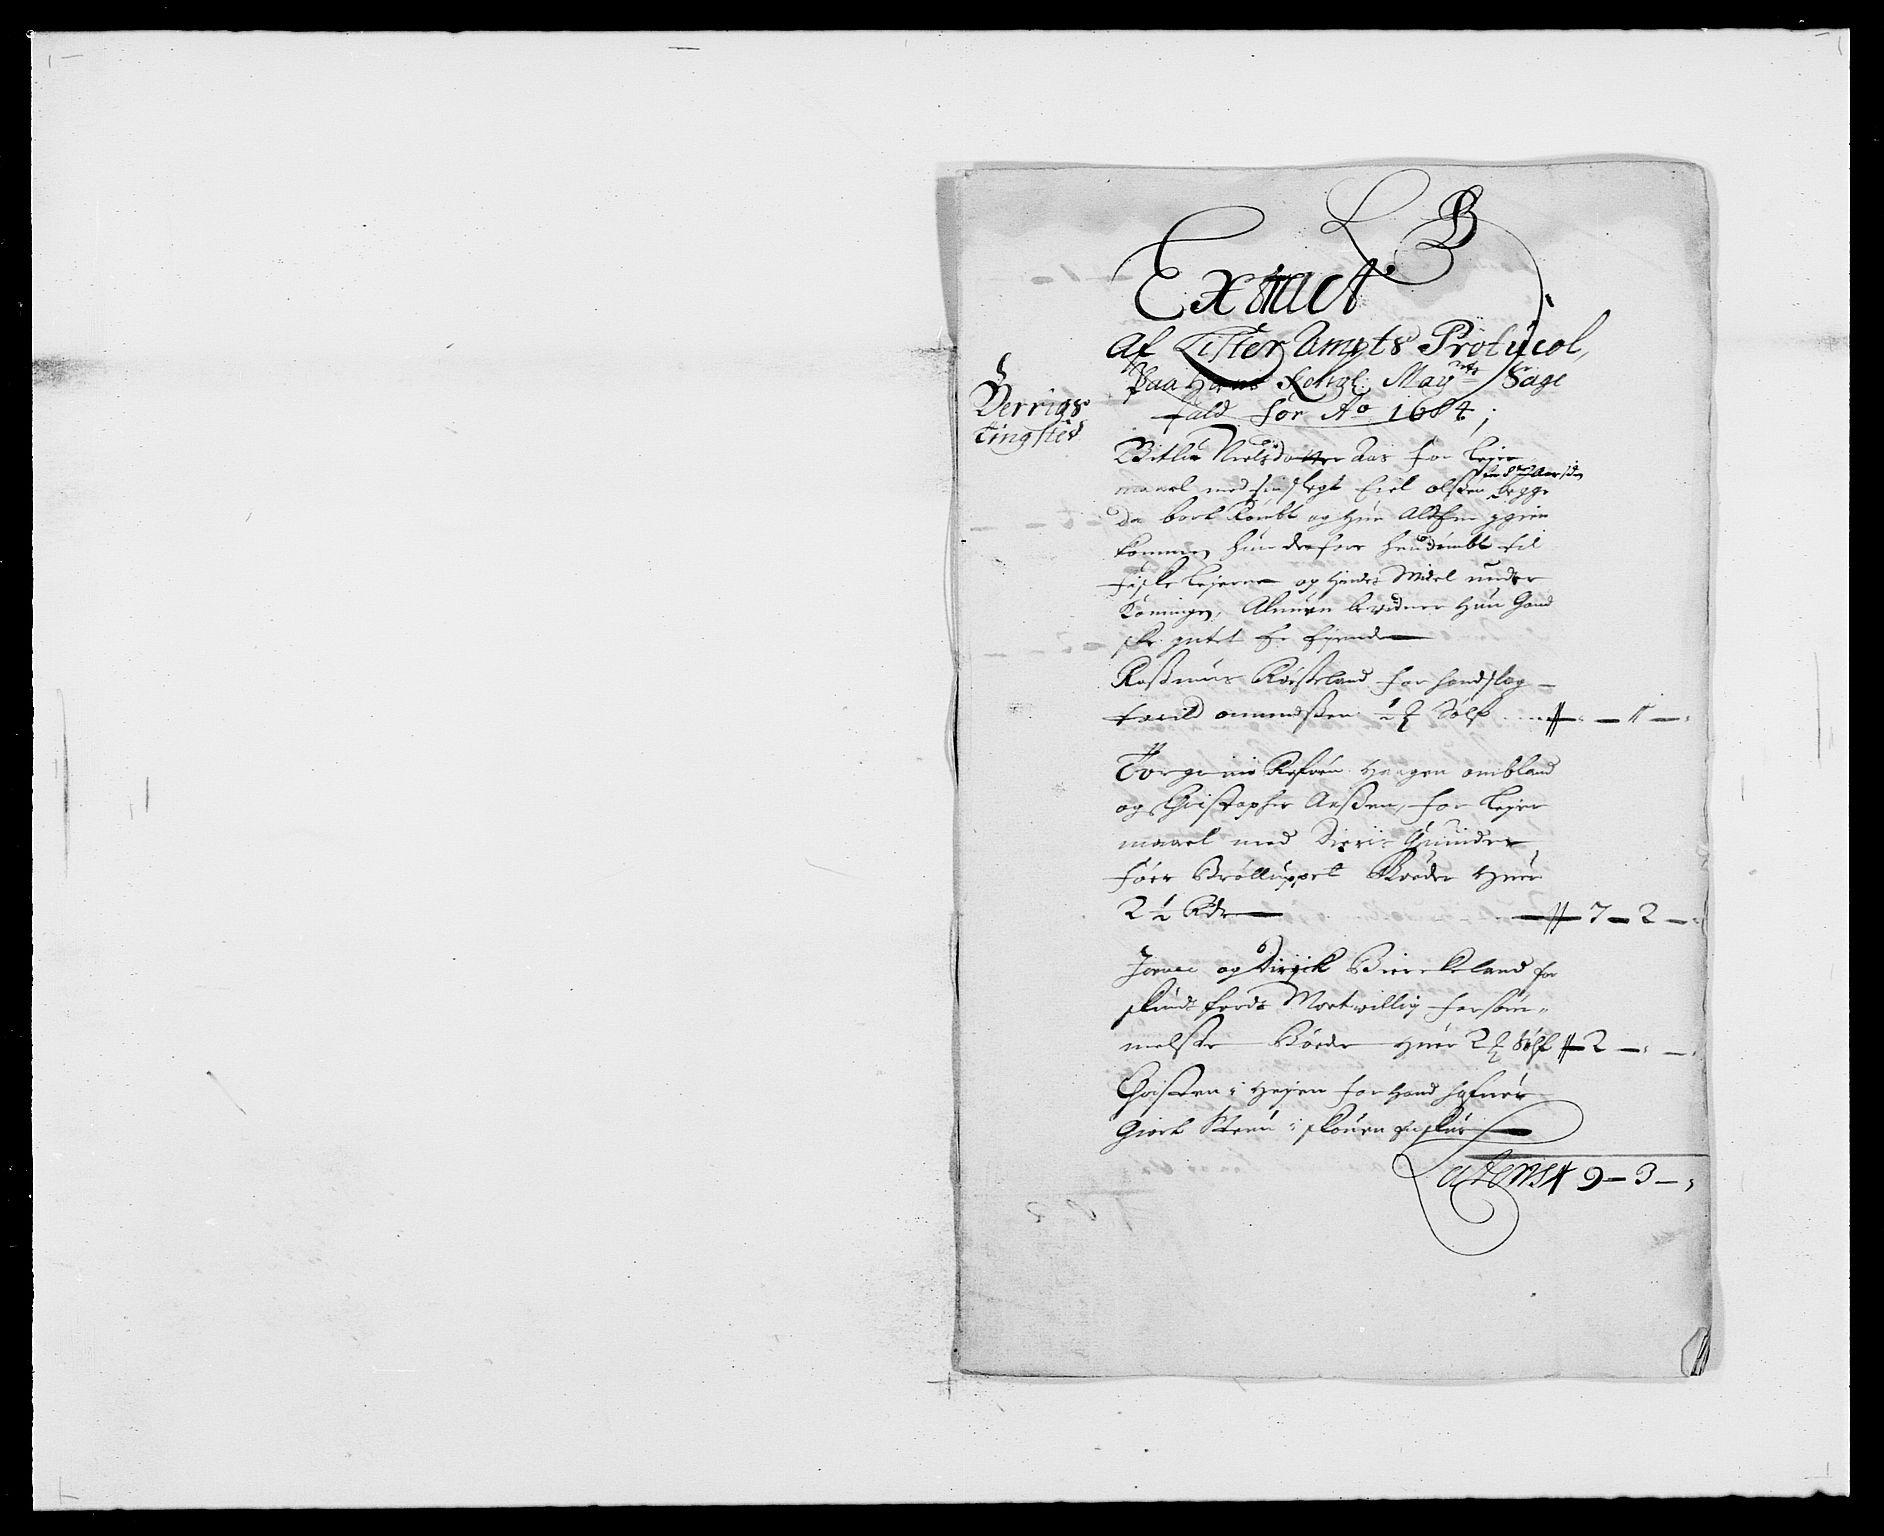 RA, Rentekammeret inntil 1814, Reviderte regnskaper, Fogderegnskap, R41/L2533: Fogderegnskap Lista, 1684-1685, s. 54